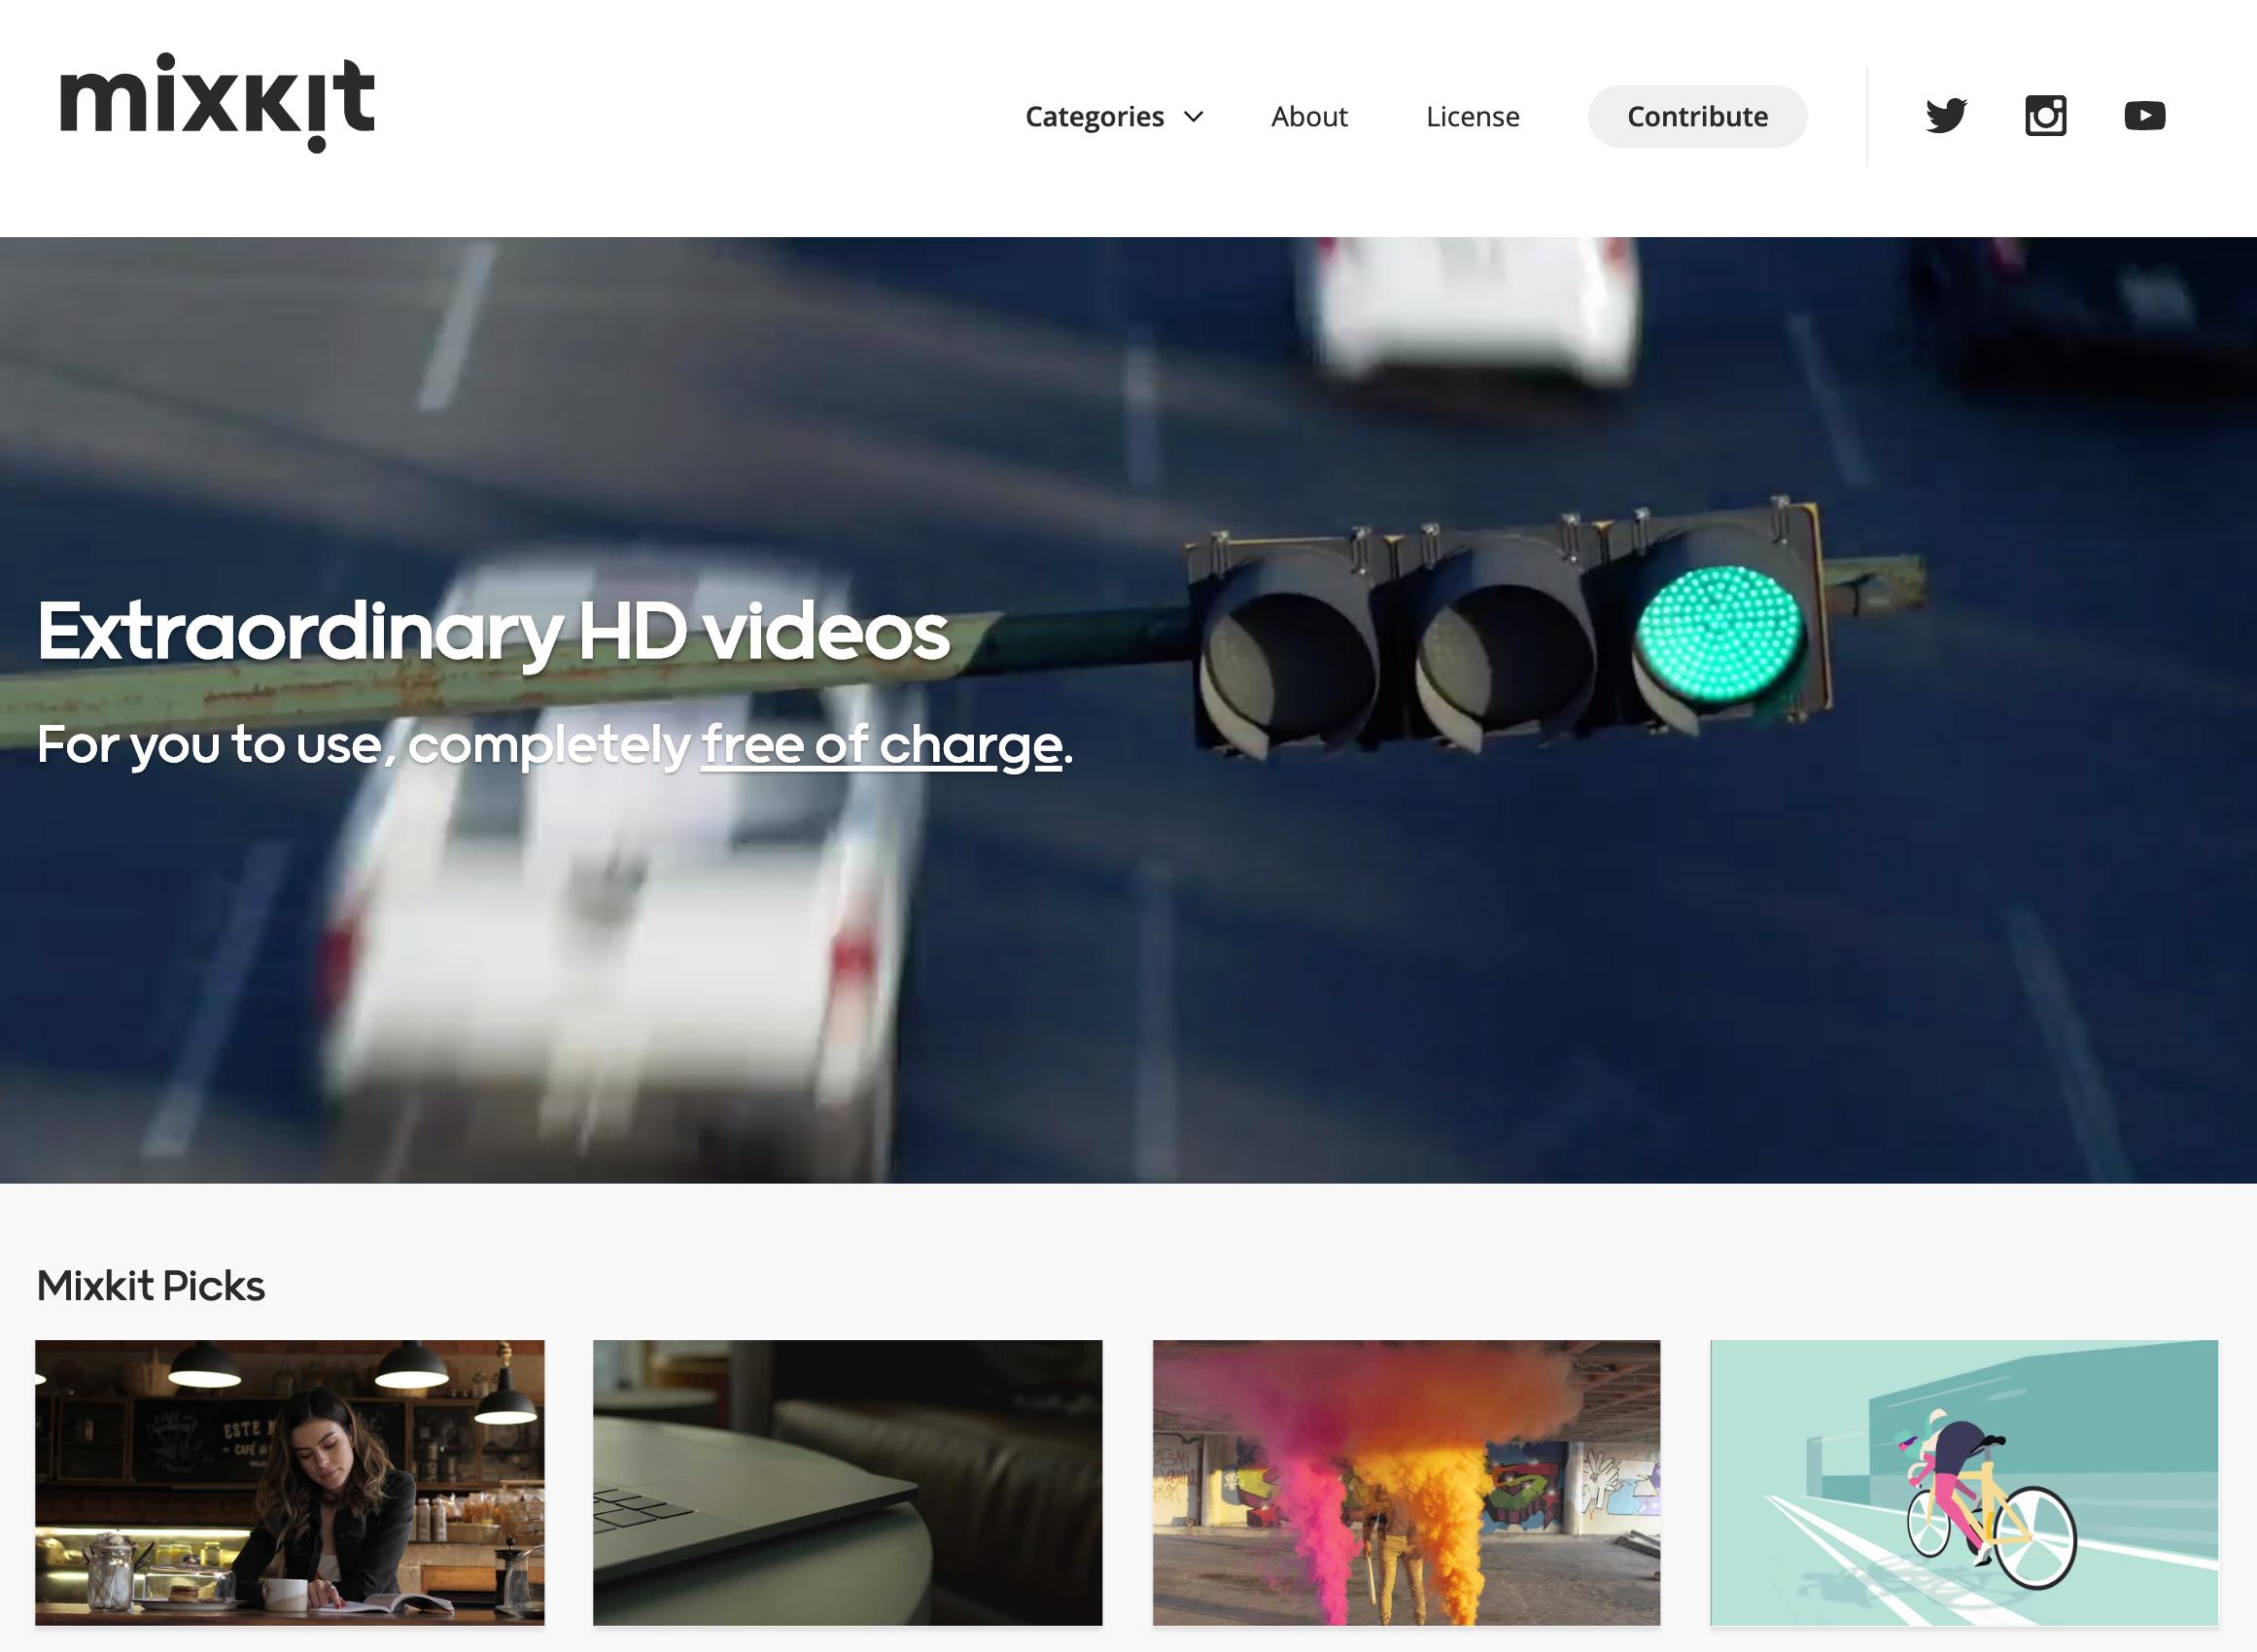 mixkit homepage